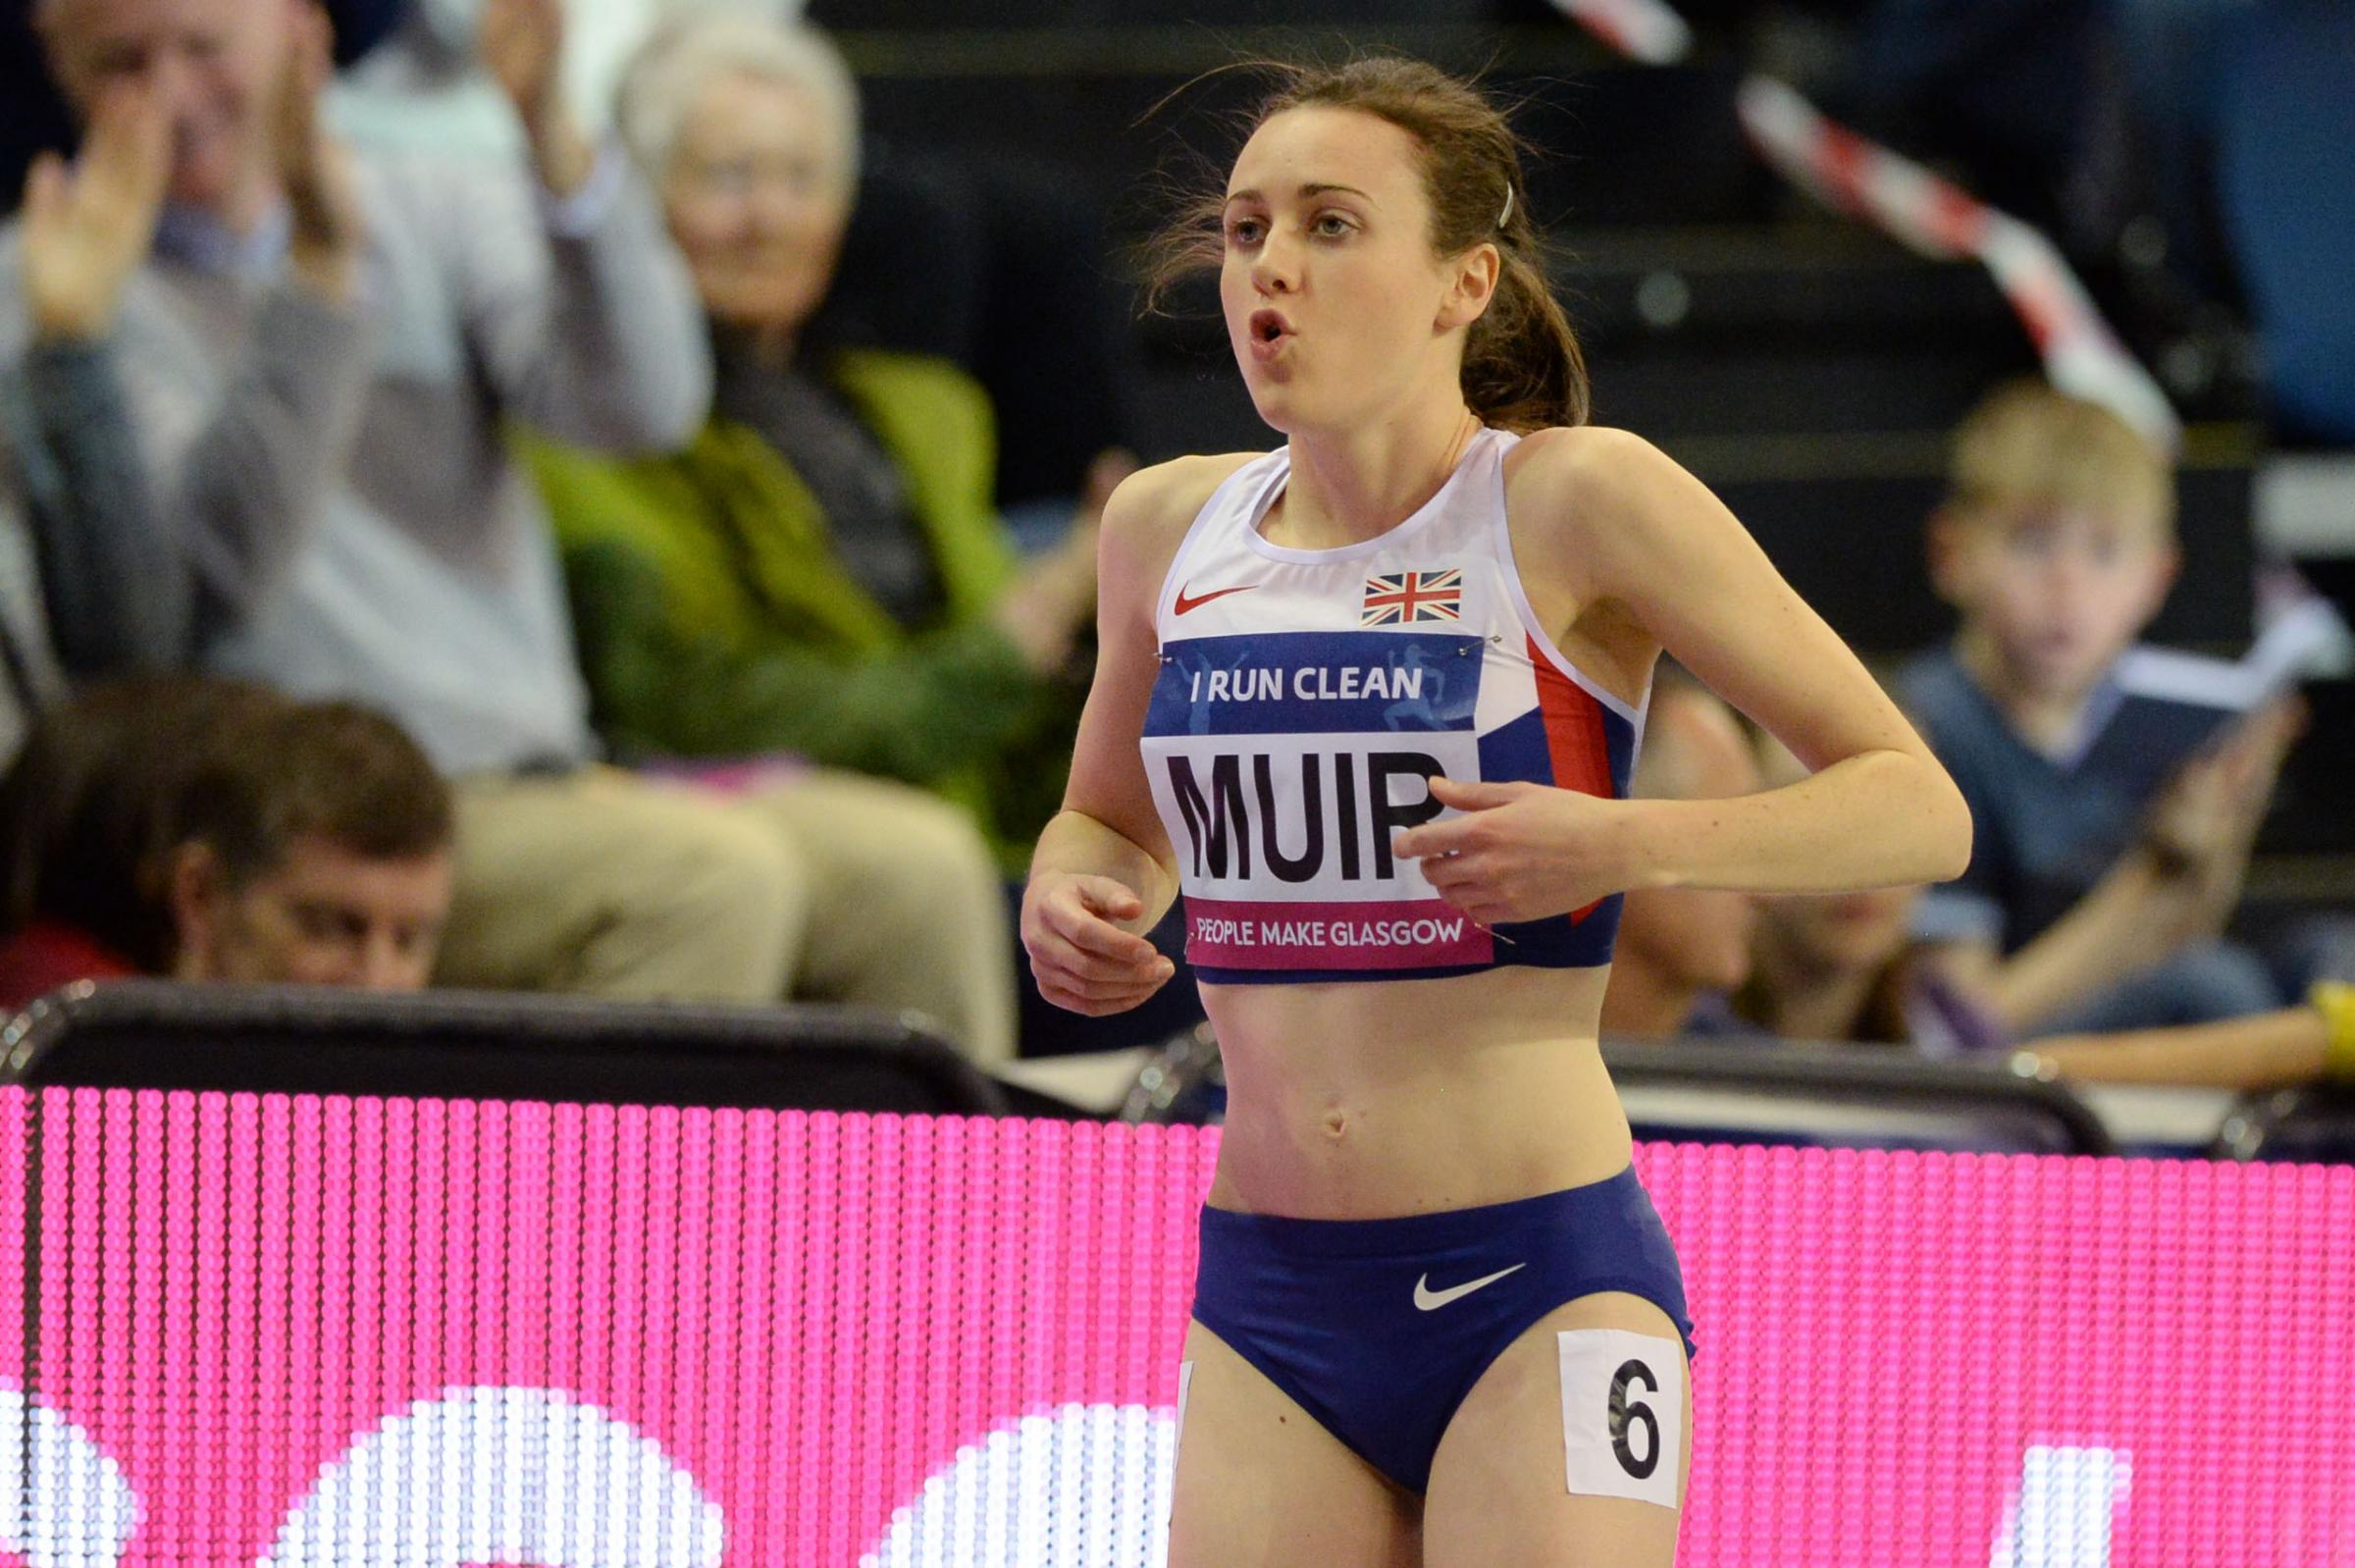 Laura Muir age